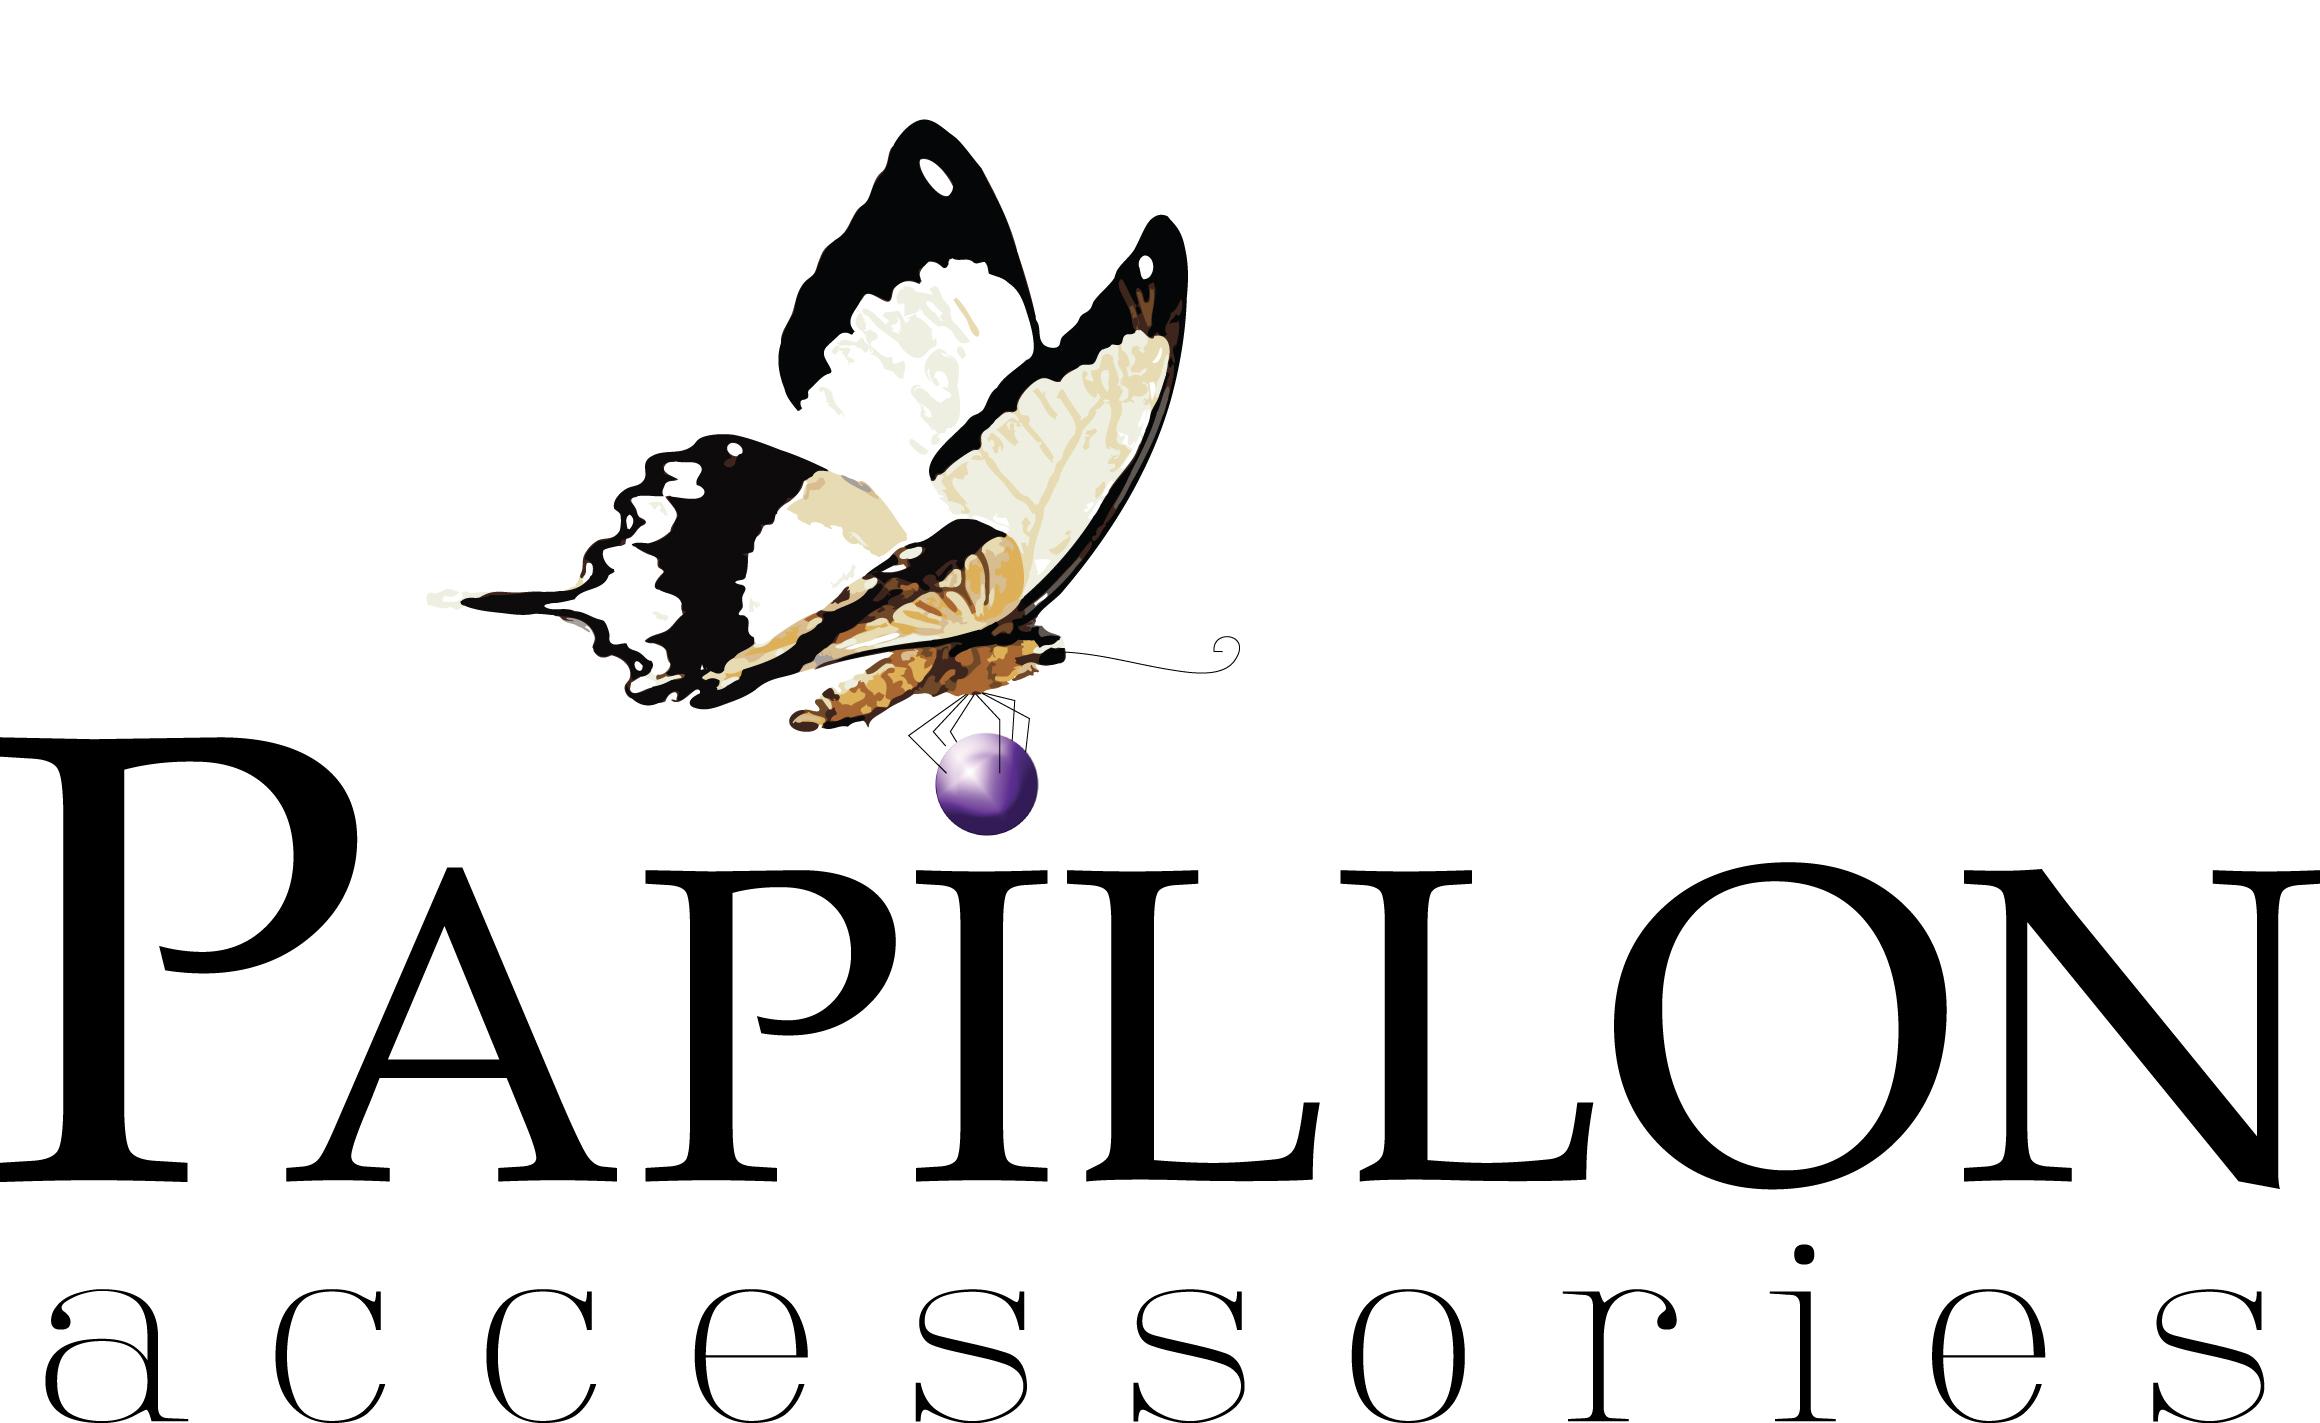 00 Papillon Final Large.jpg